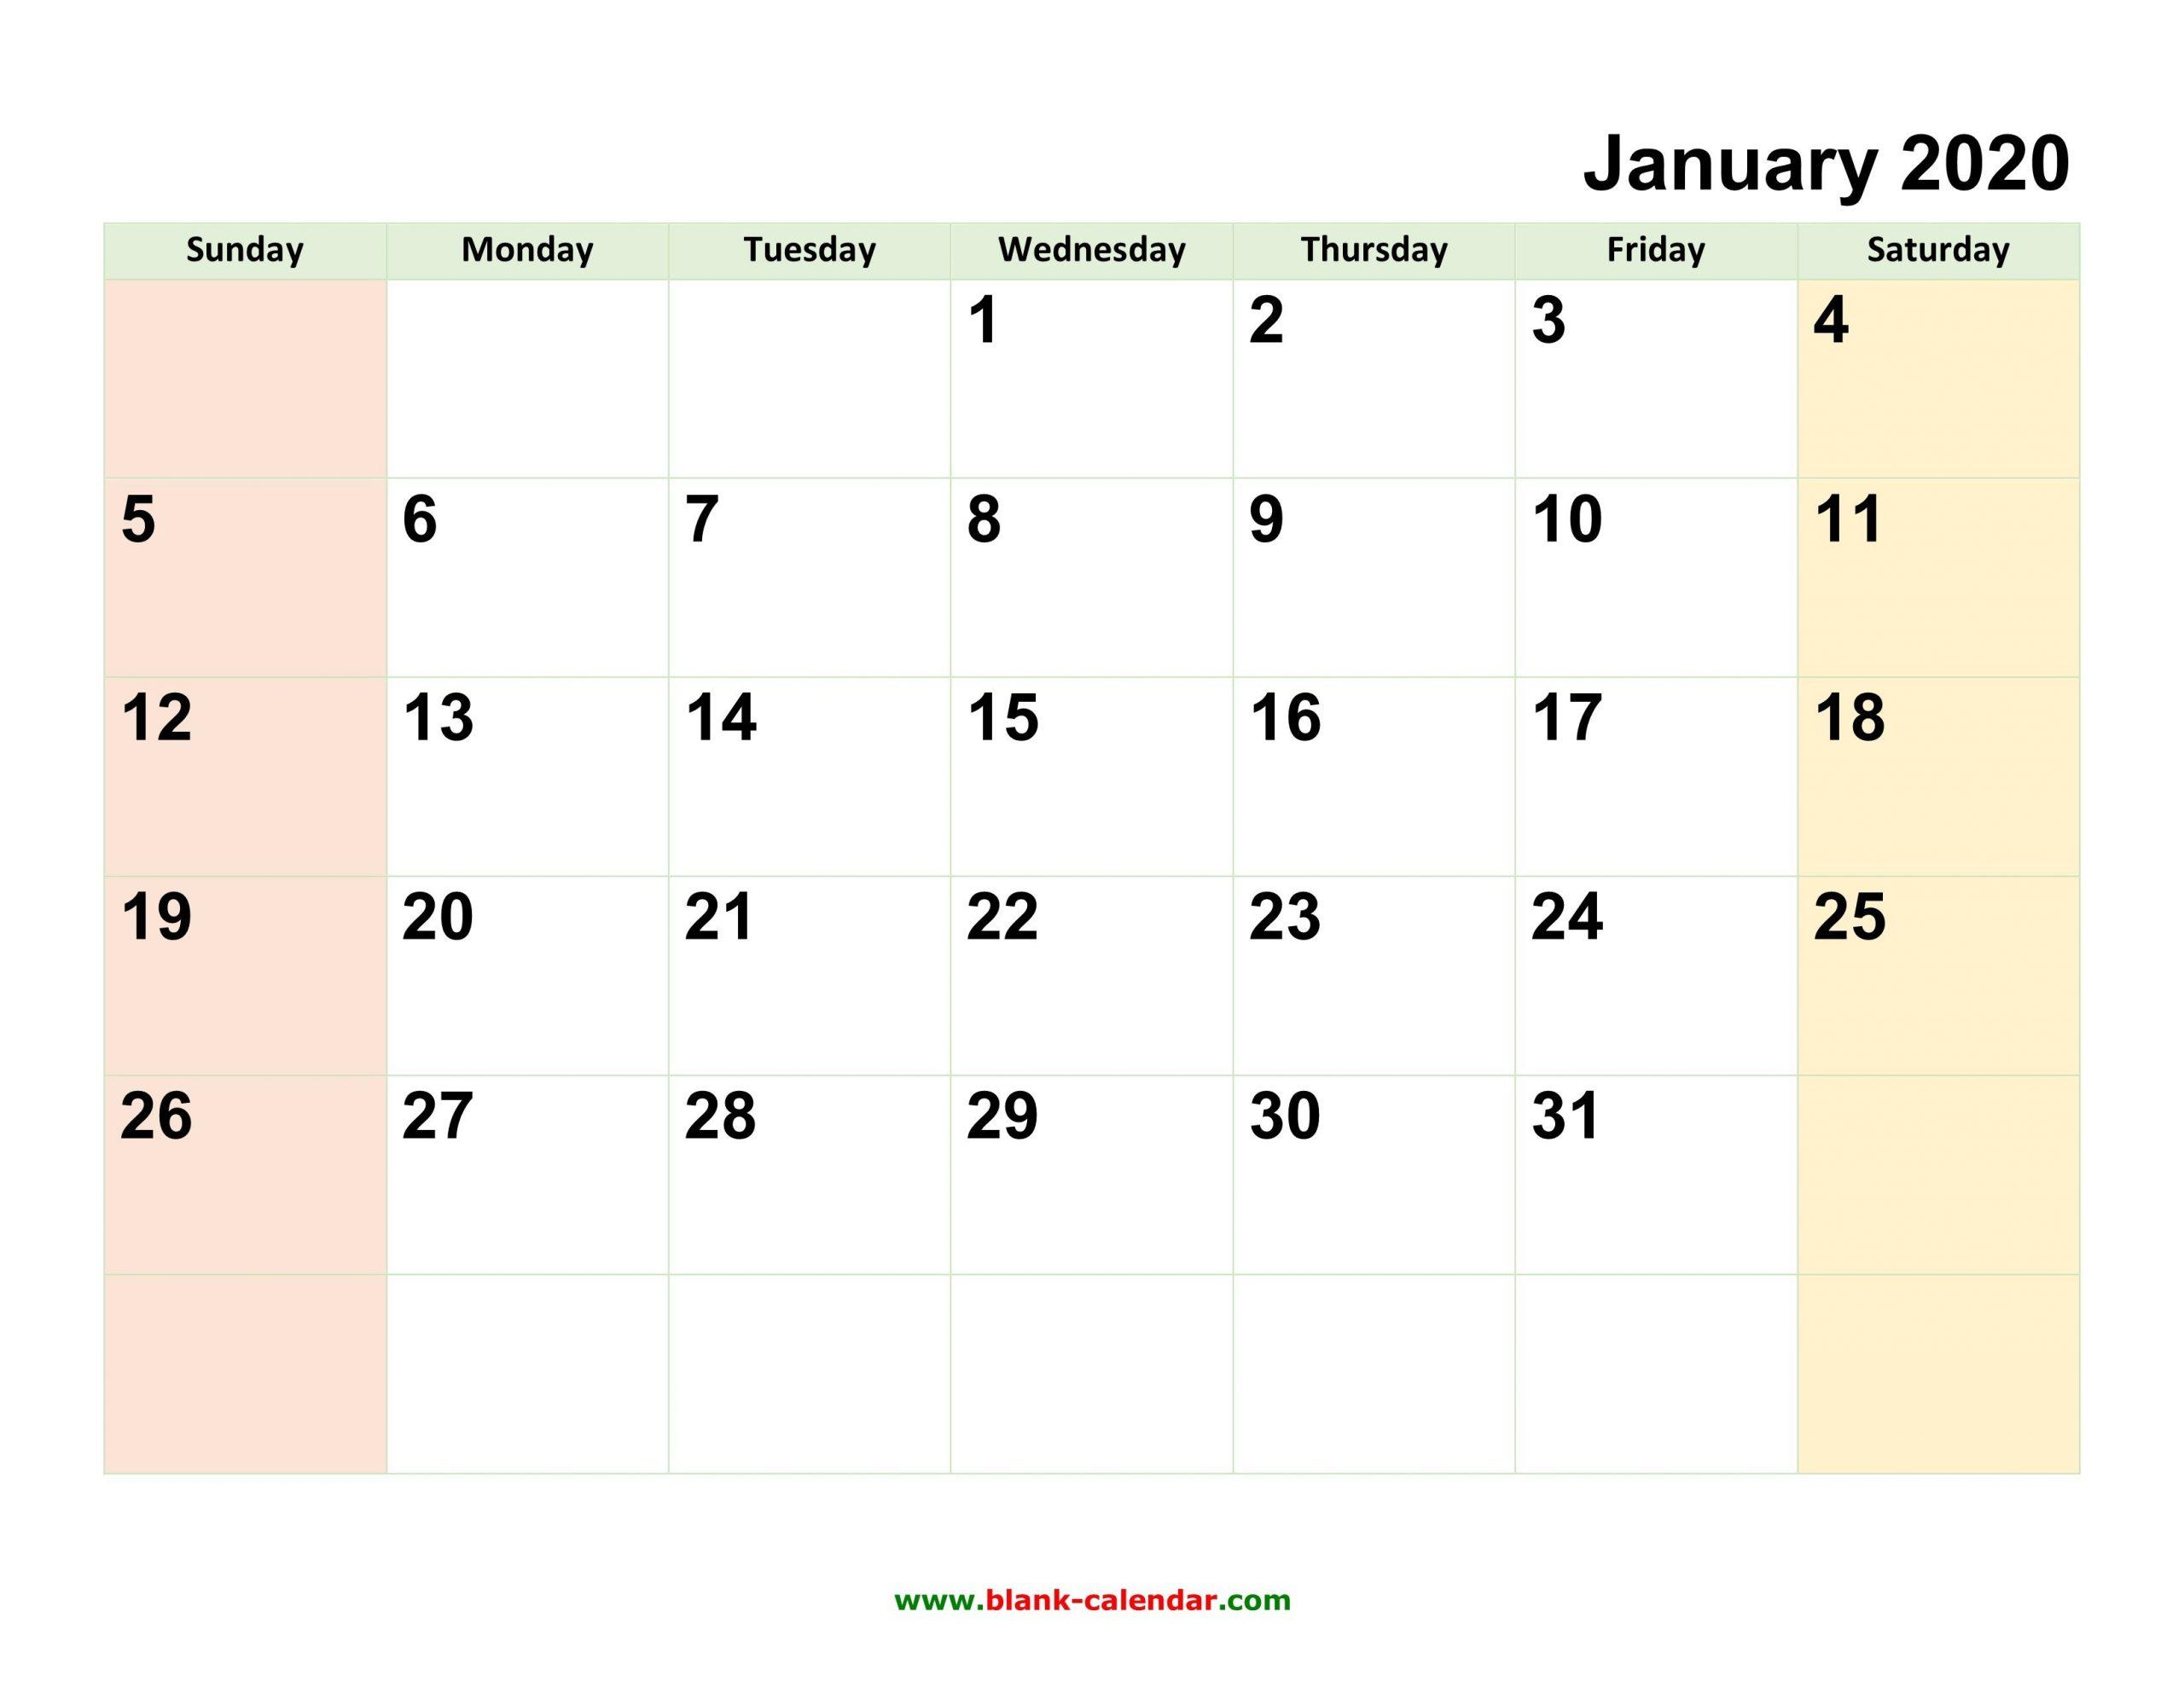 Free Weekly Calander That You Can Edit :-Free Calendar Editable 2 Week Calendars